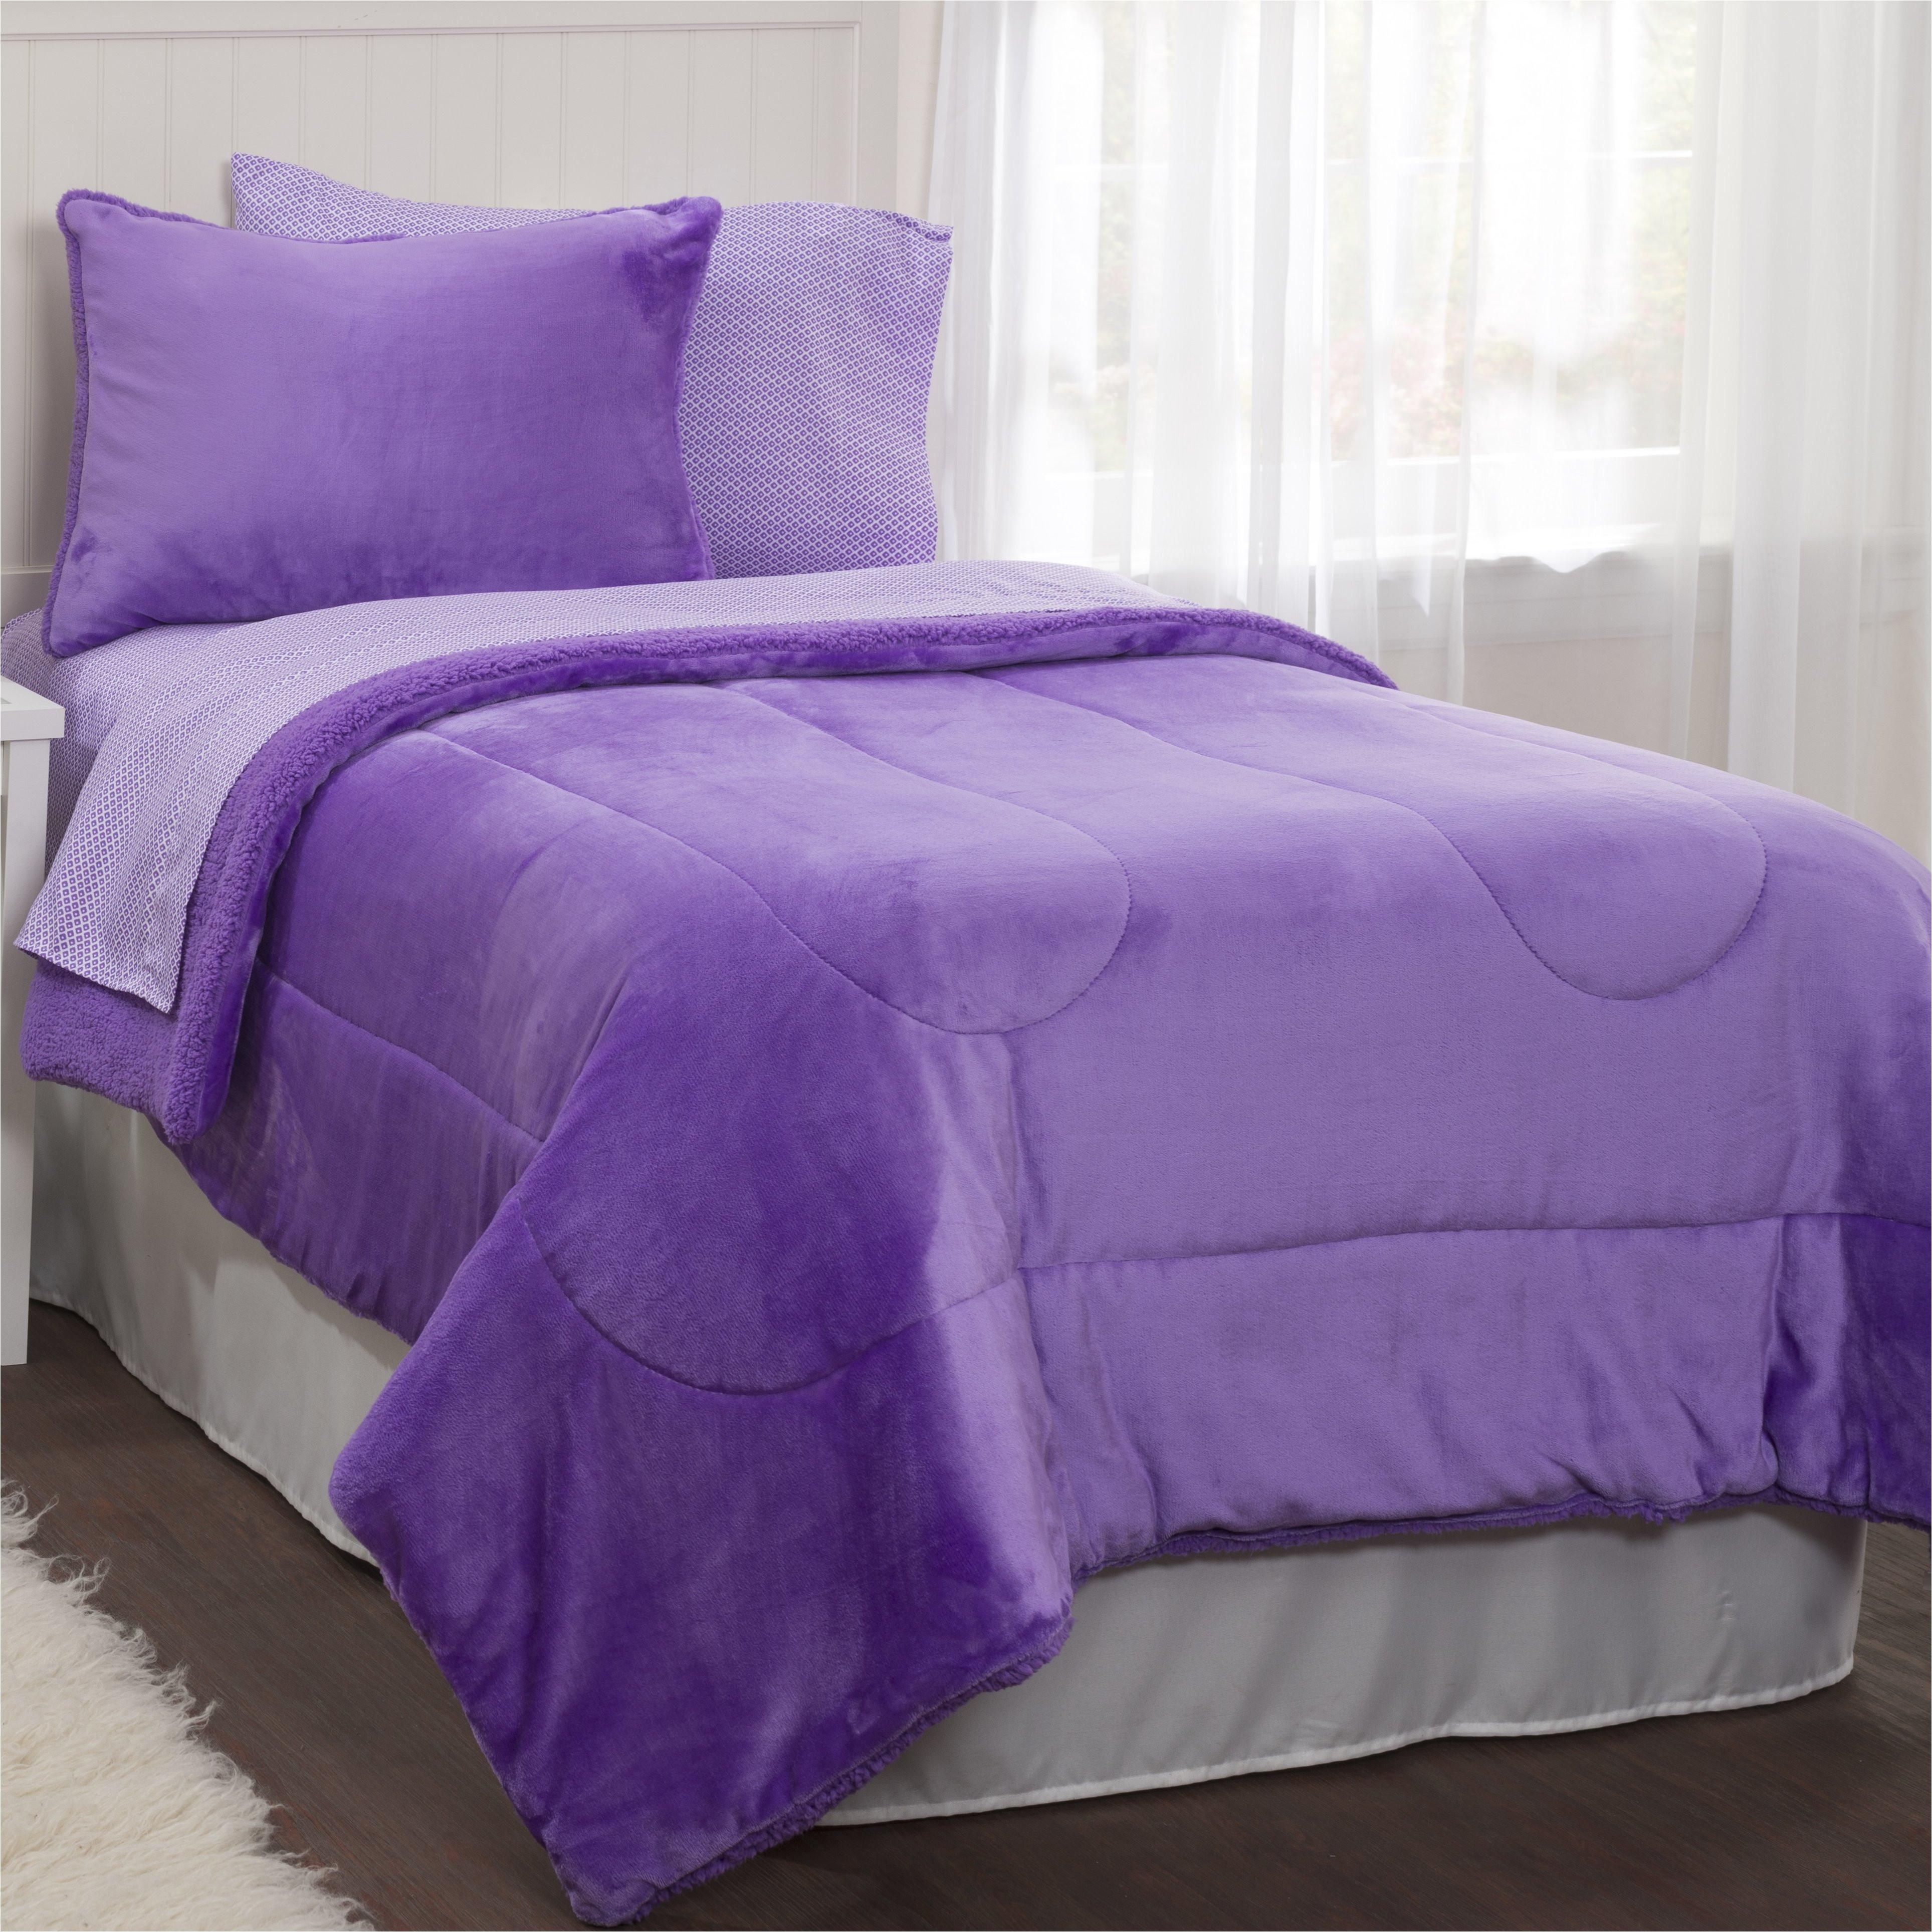 neel lavender reversible comforter set jpg